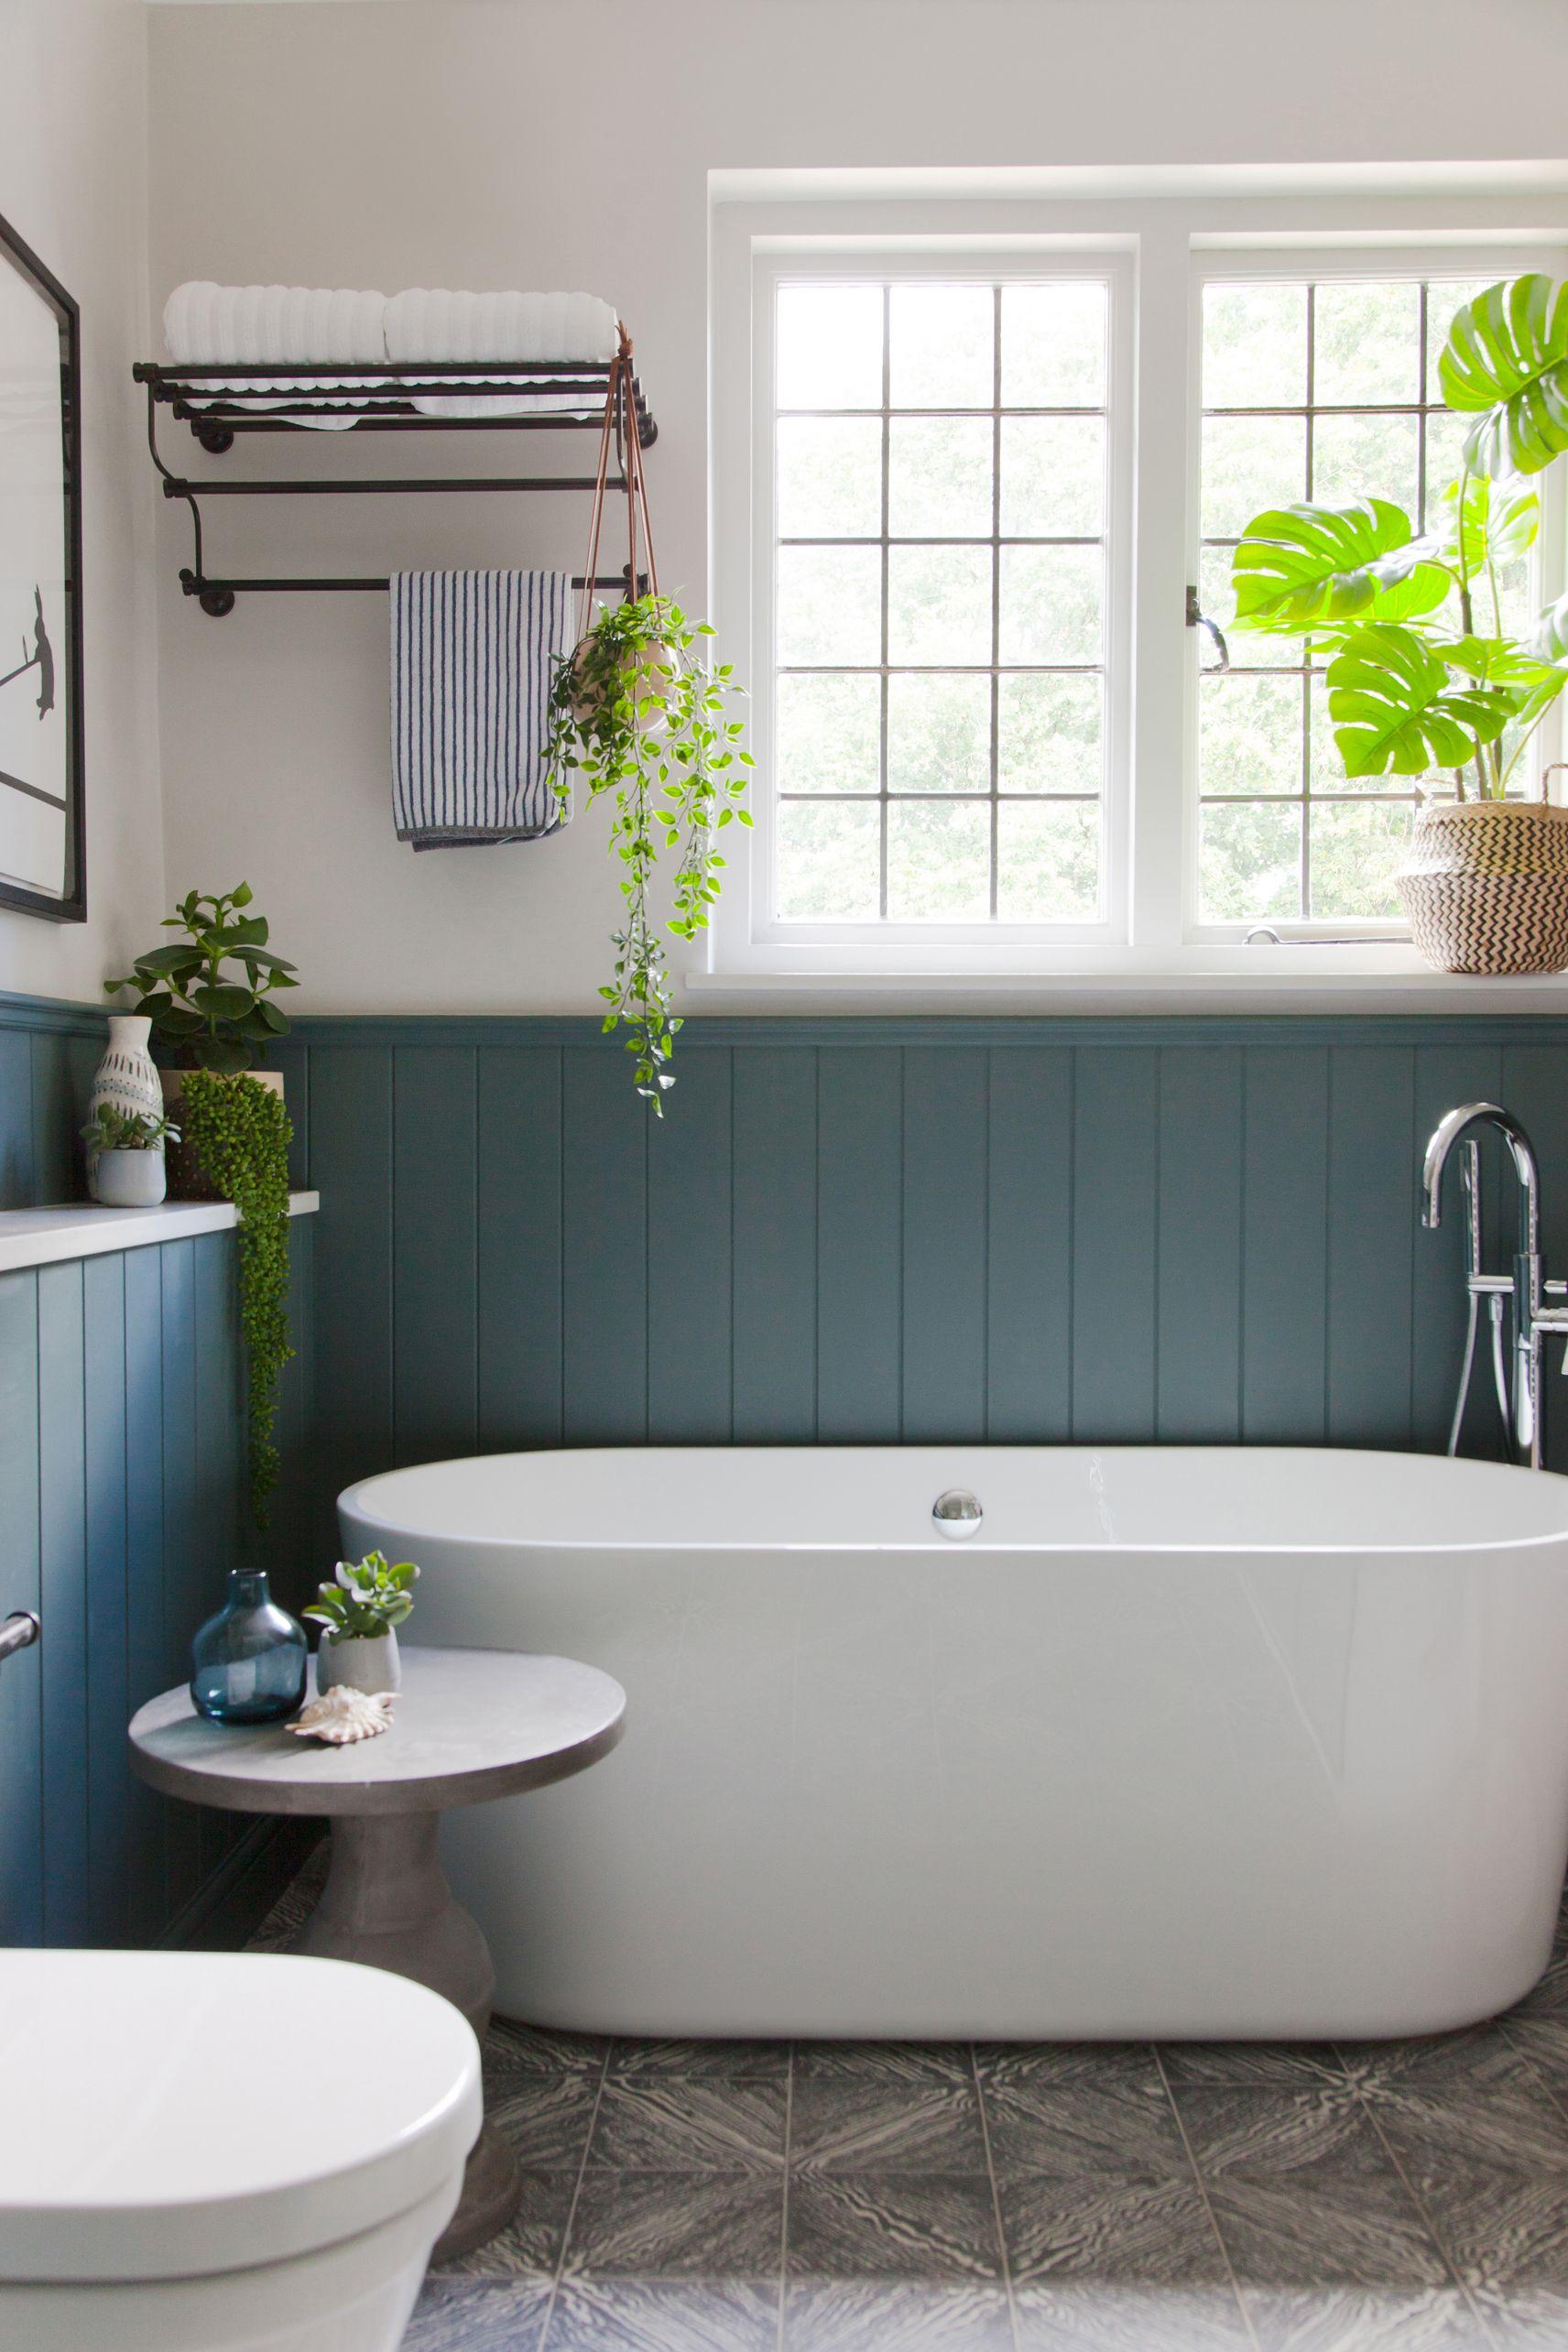 20 Best Bathroom Storage Ideas In 2019 Creative Bathroom within proportions 1712 X 2568